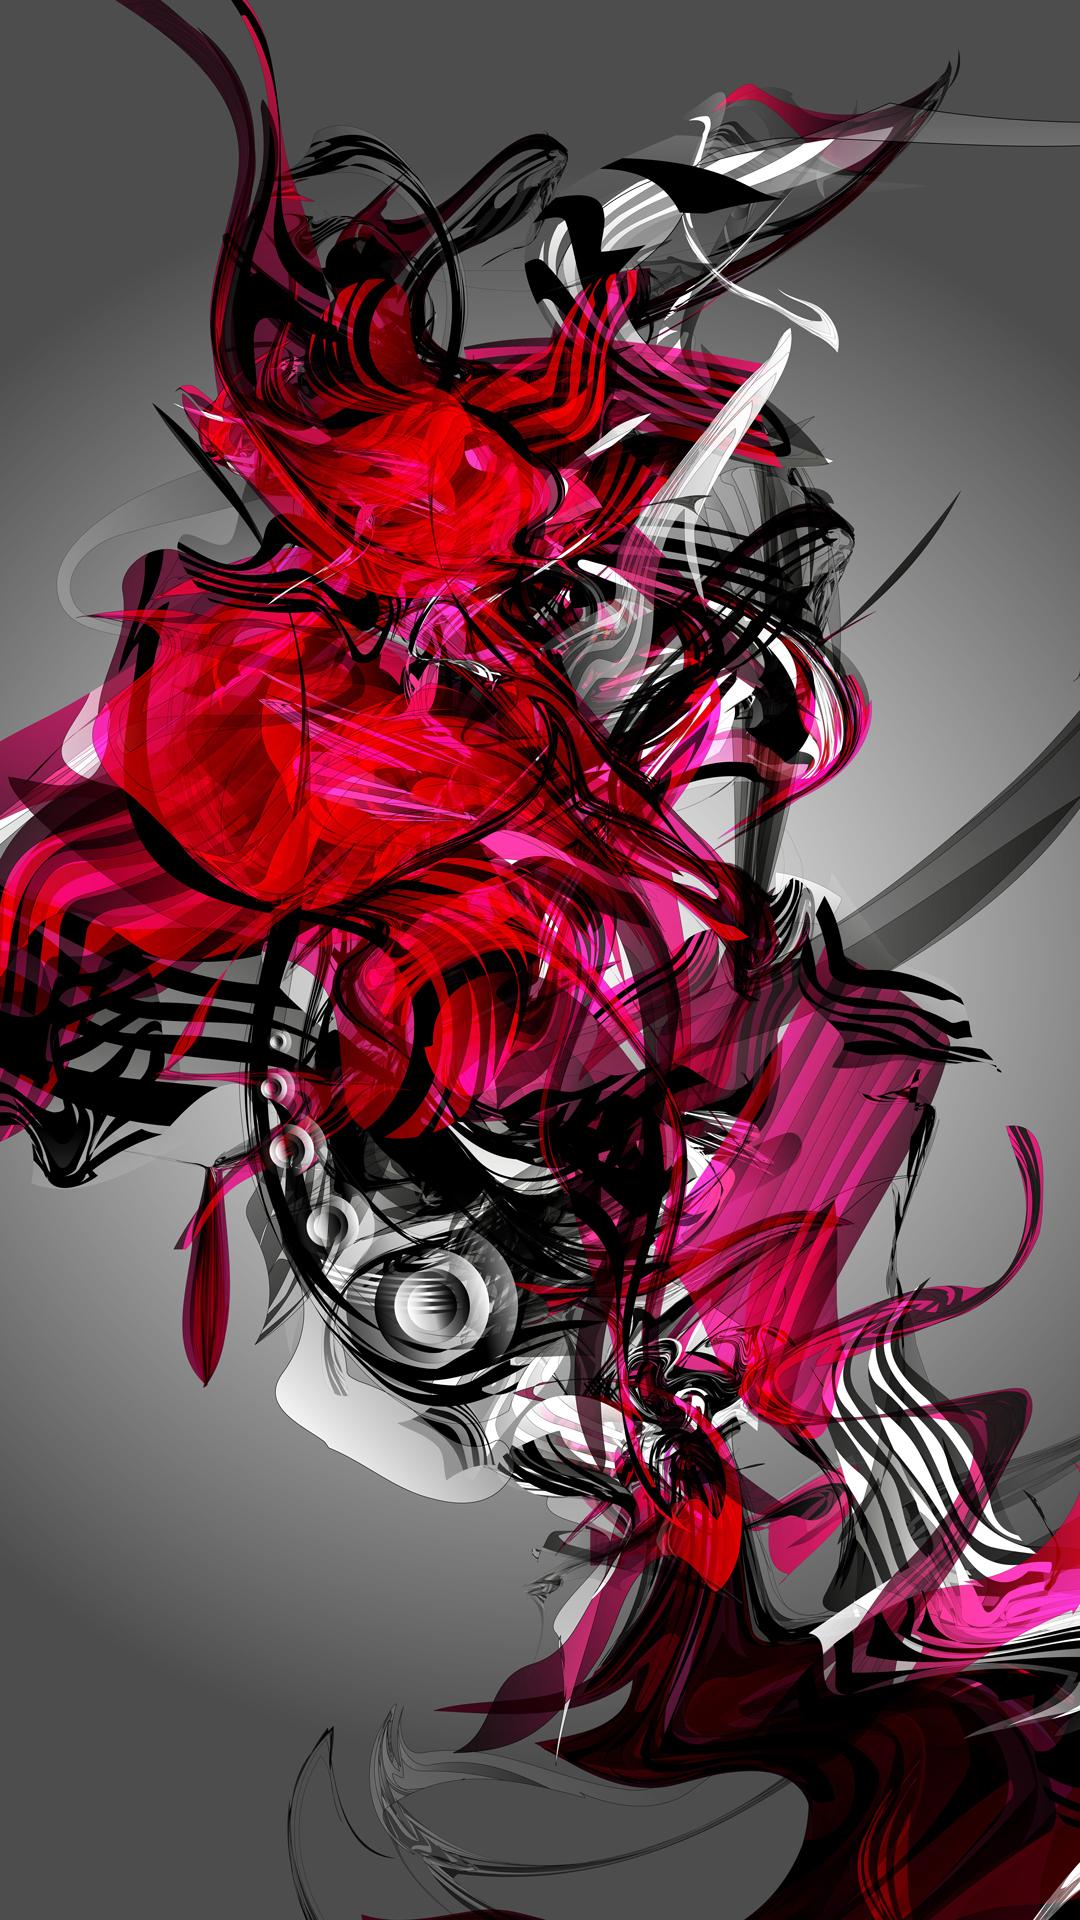 Fondo de pantalla abstracto magenta